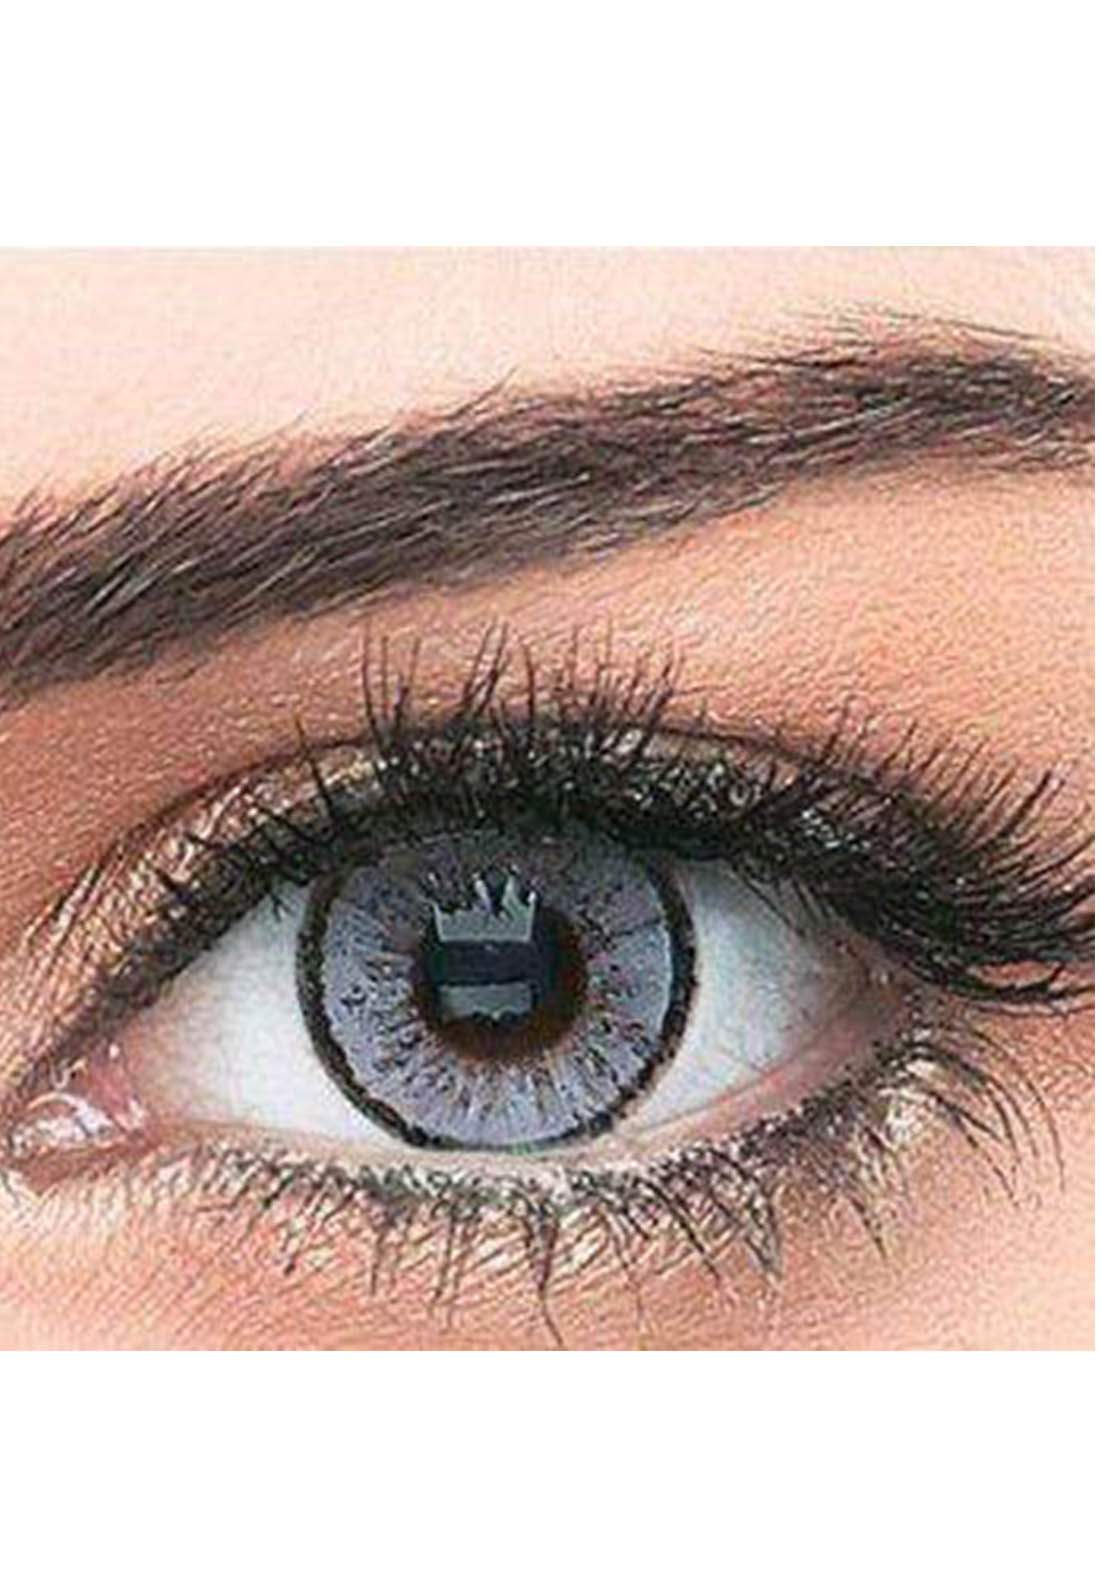 Bella Classic 301011 Contact Lenses 3 Months Use Elegance - Gray No.12 عدسات لاصقة